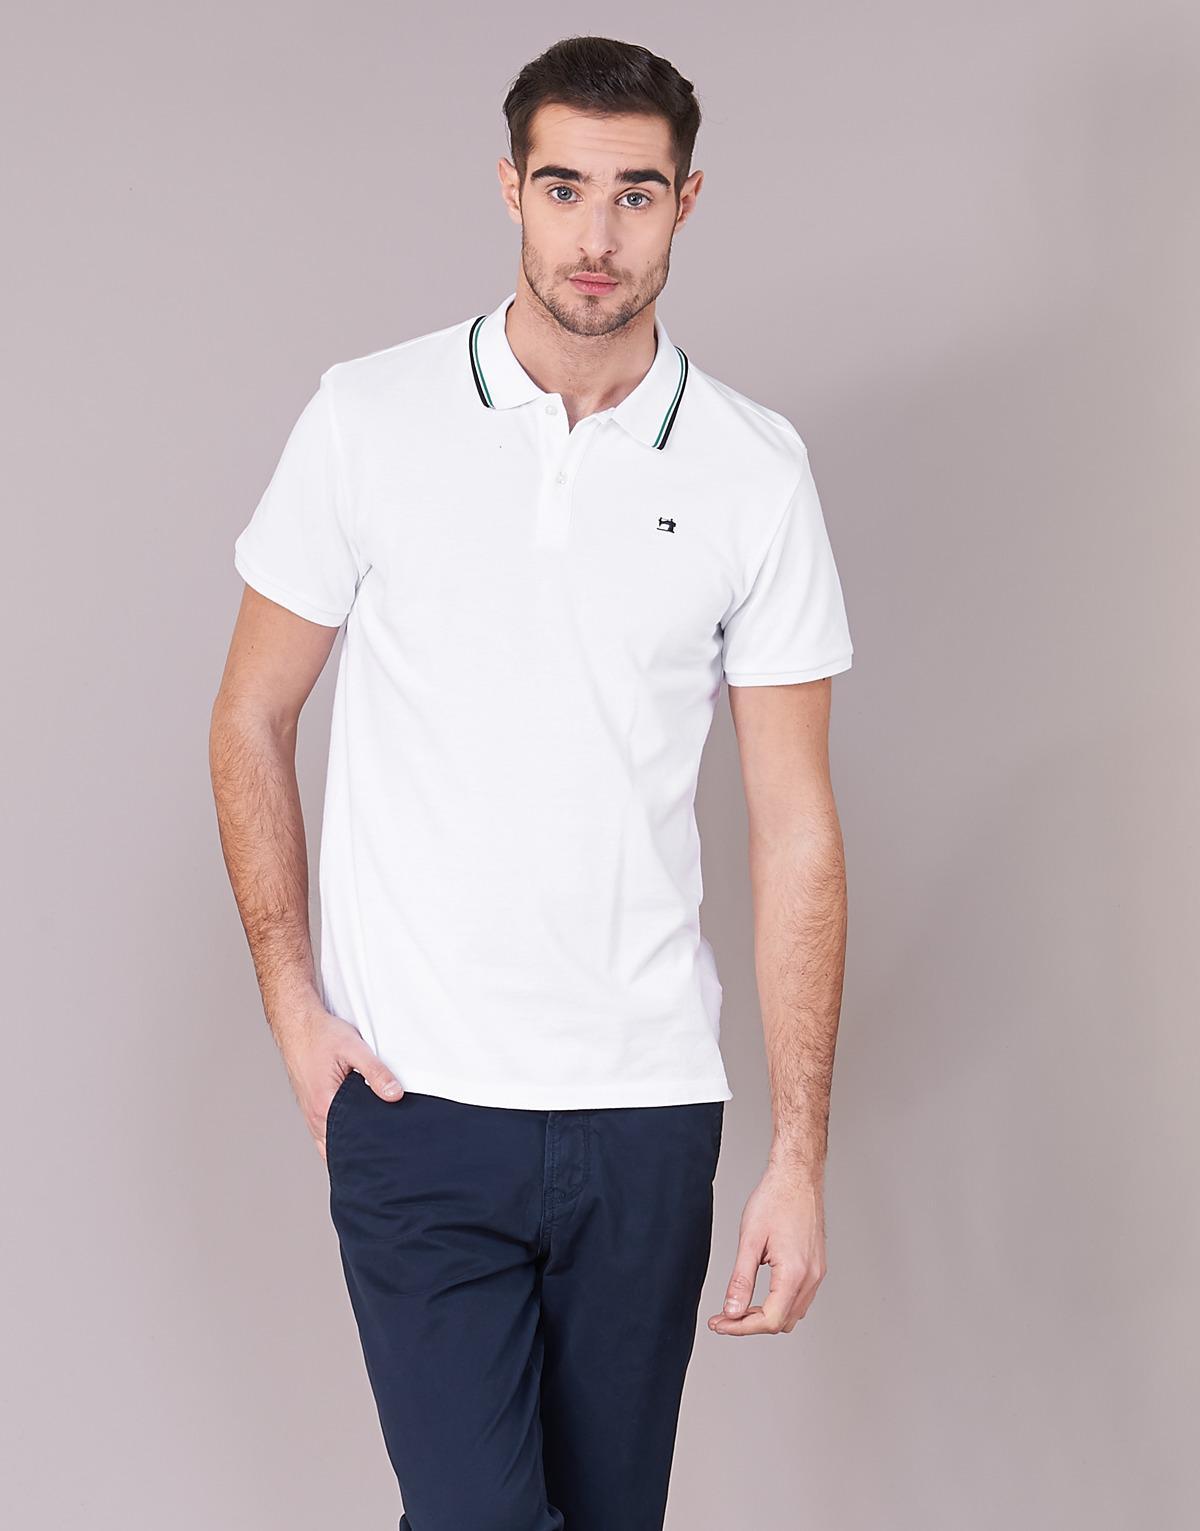 57d38064c Scotch & Soda Yardn Polo Shirt in White for Men - Lyst